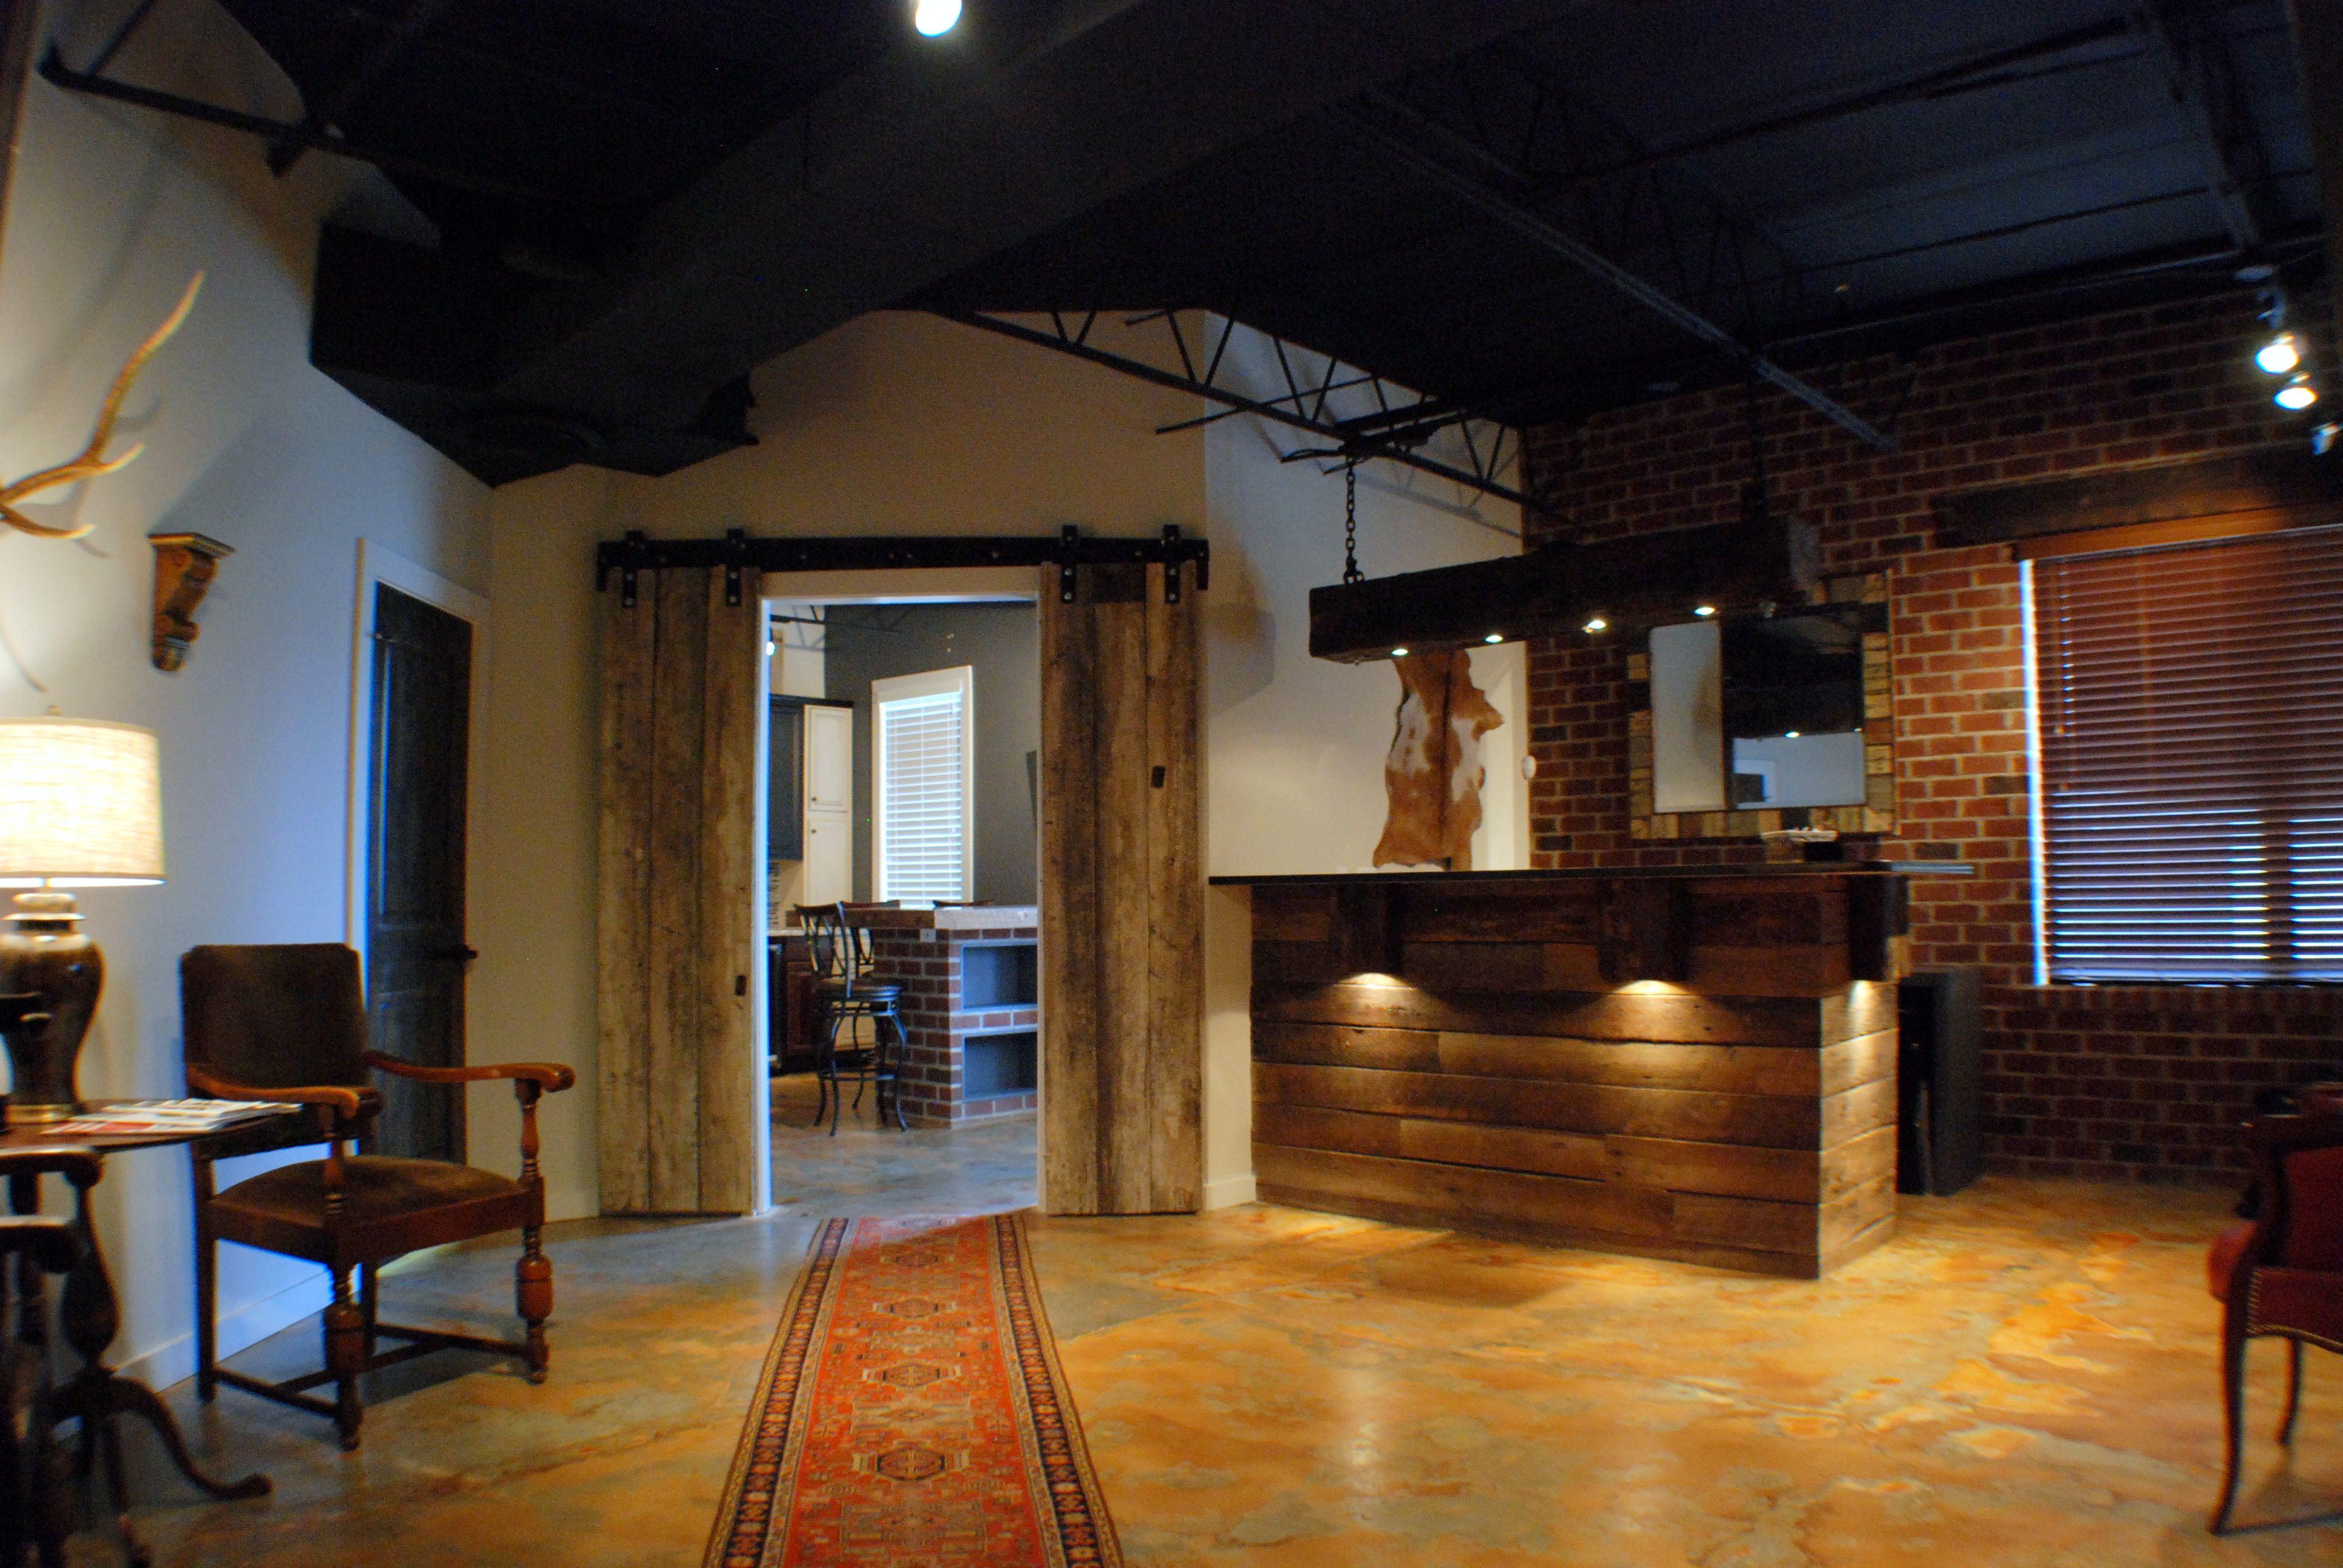 Custom barn doors reception desk made of reclaimed wood